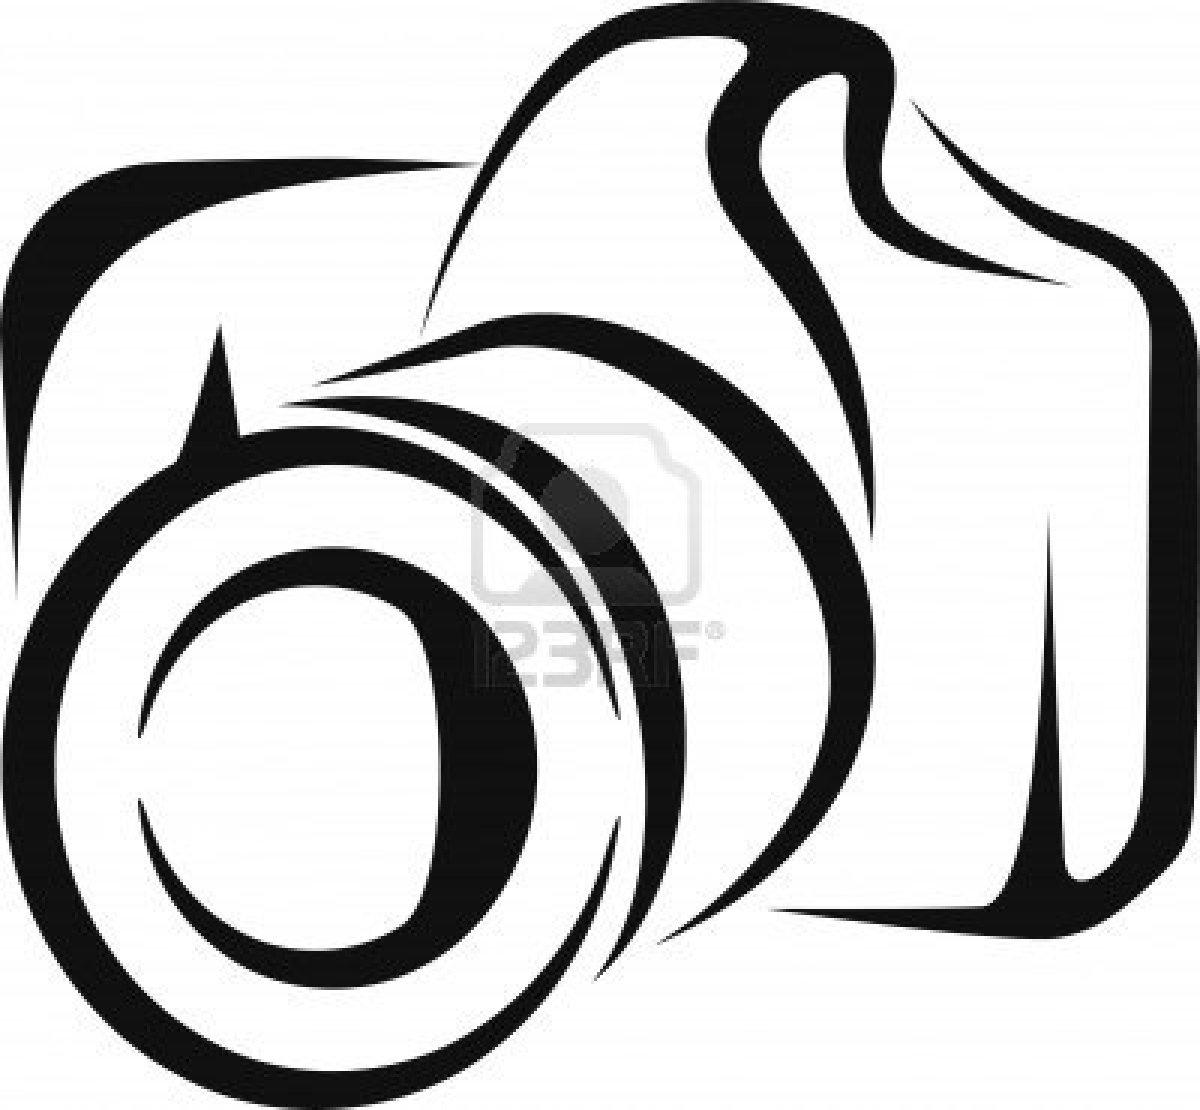 hight resolution of 1200x1110 nikon clipart camera logo